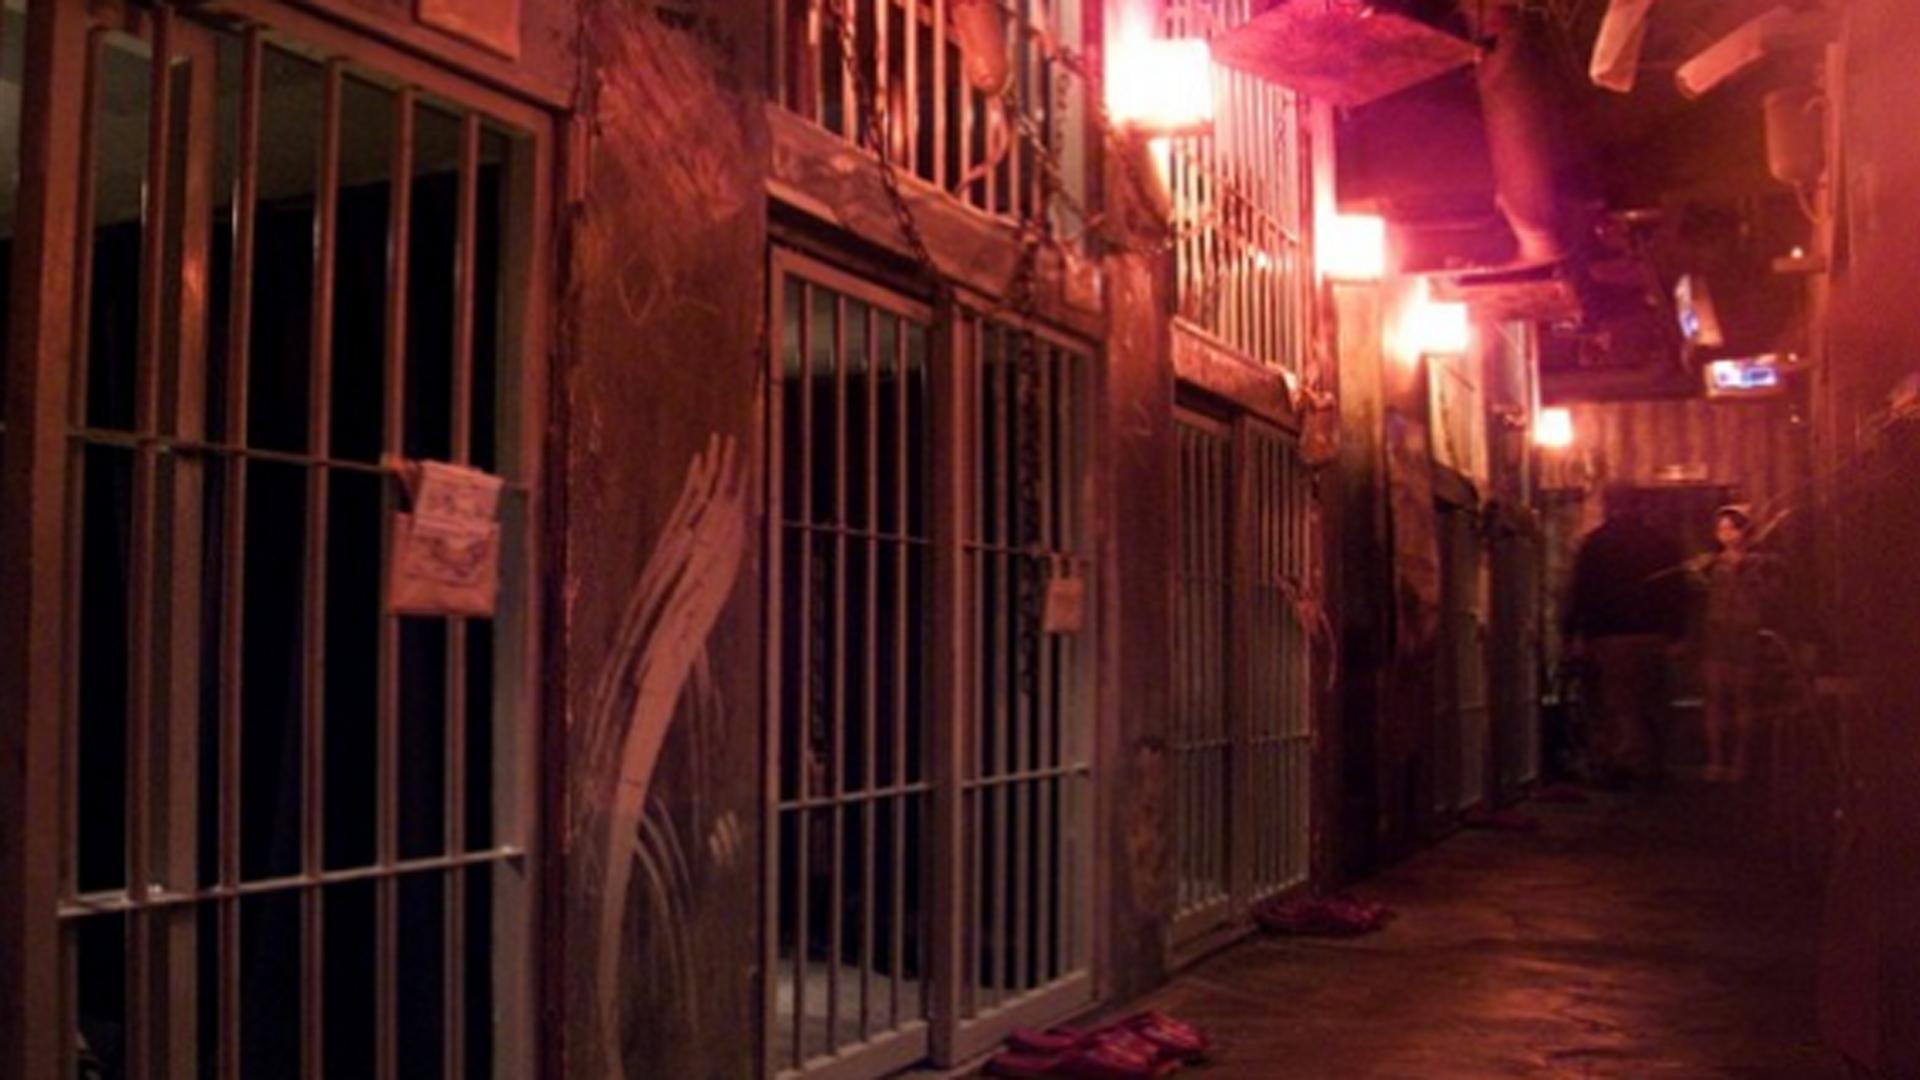 Recrea la temida cárcel de Alcatraz